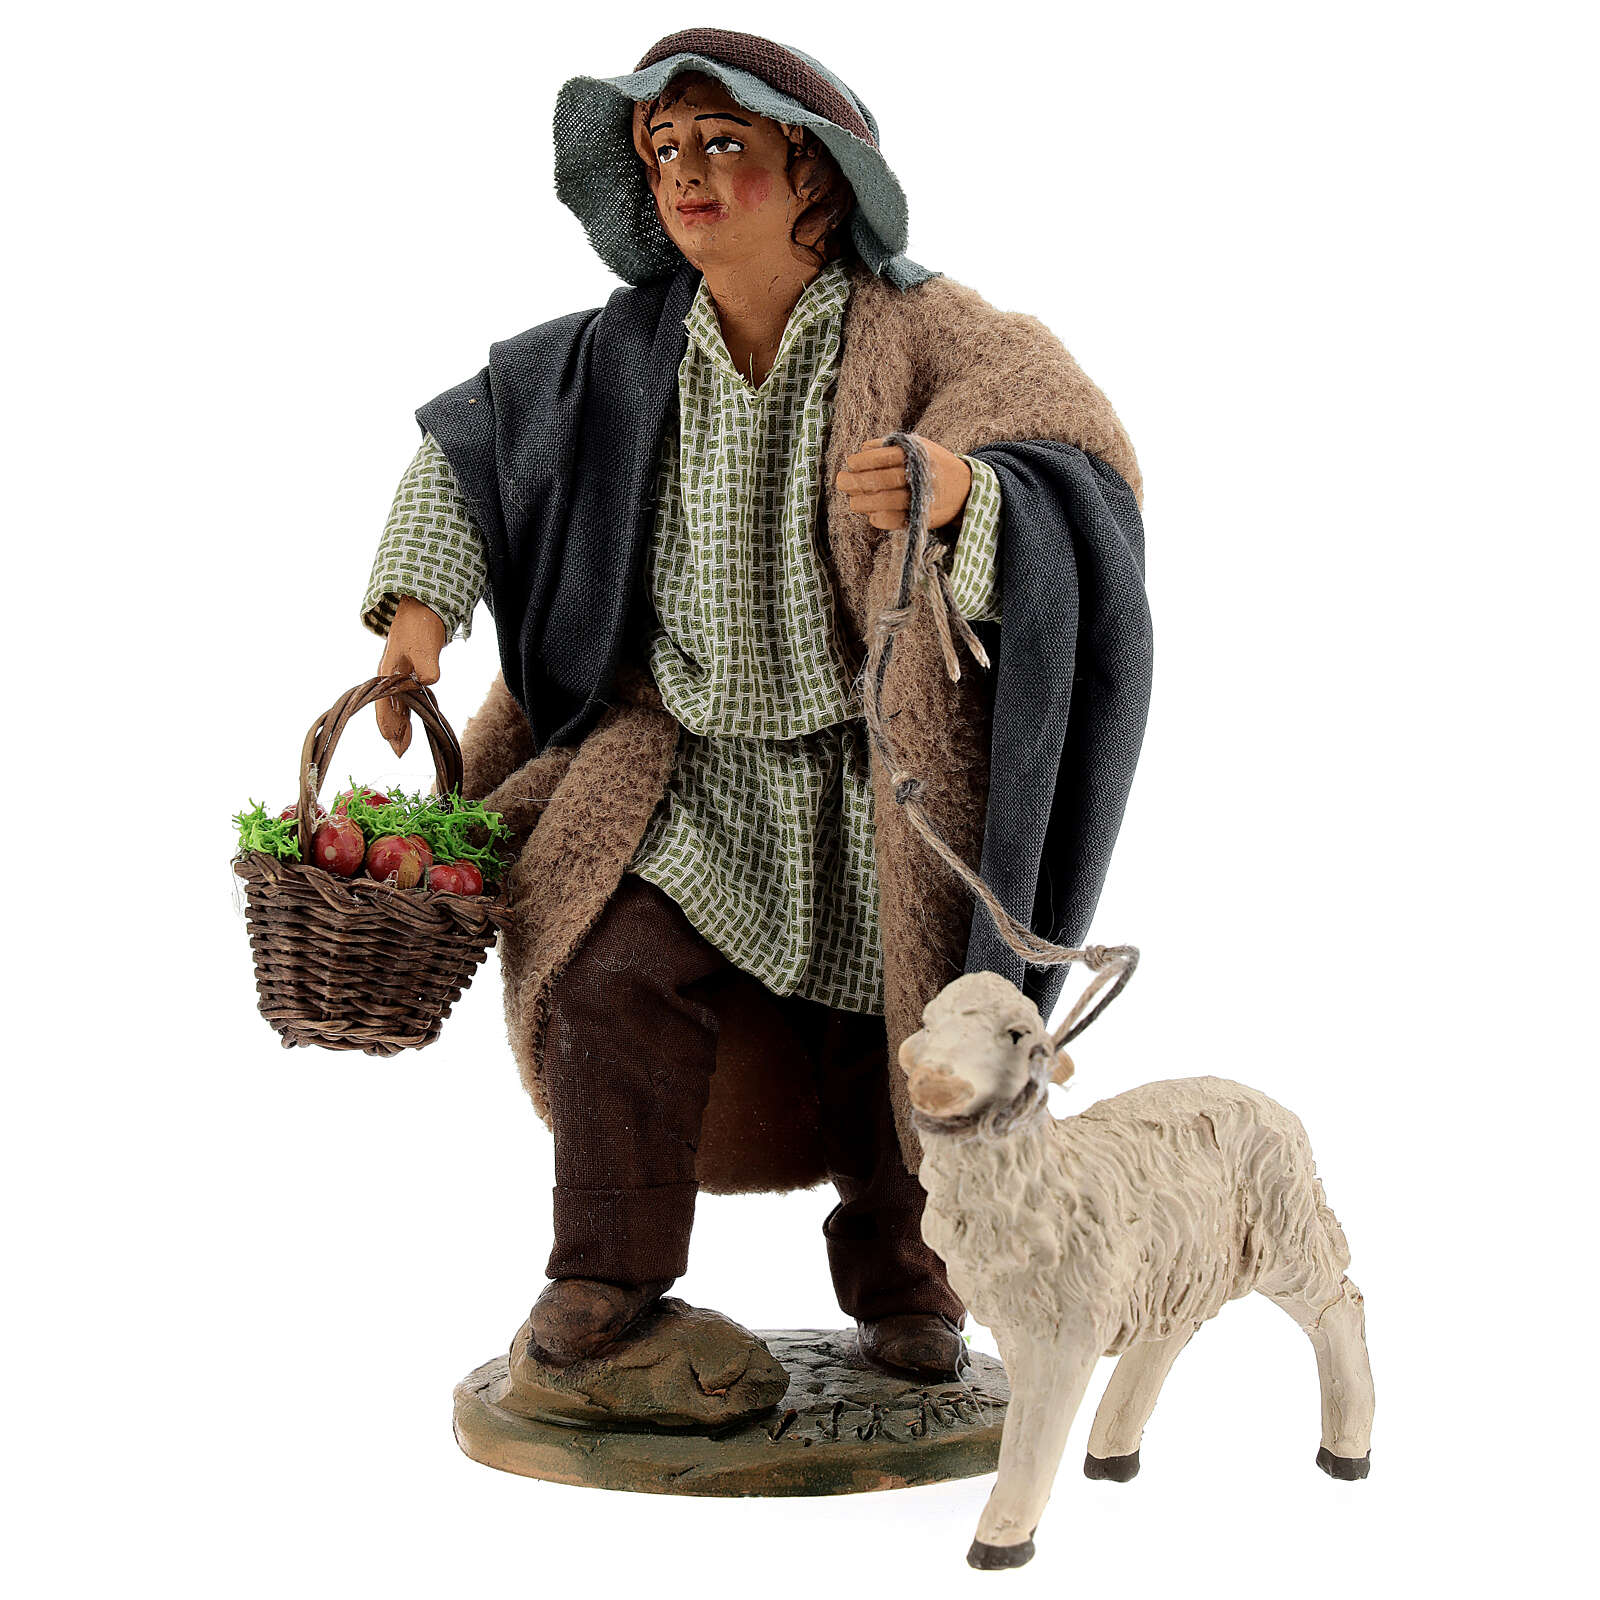 Child with basket and sheep Neapolitan Nativity Scene figurine 30 cm 4